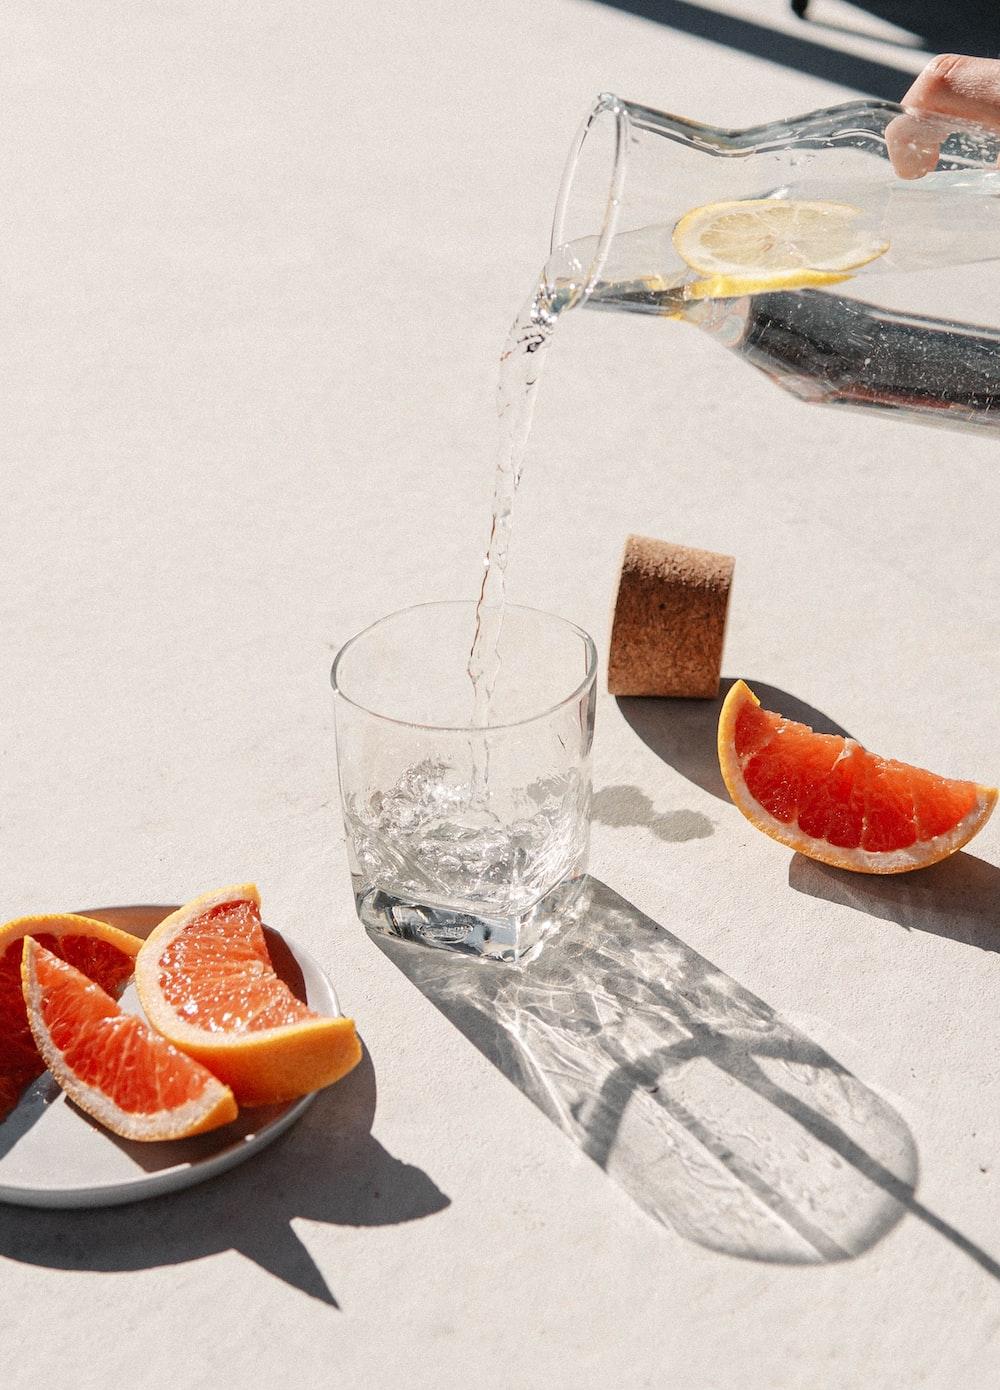 sliced orange fruit beside clear drinking glass